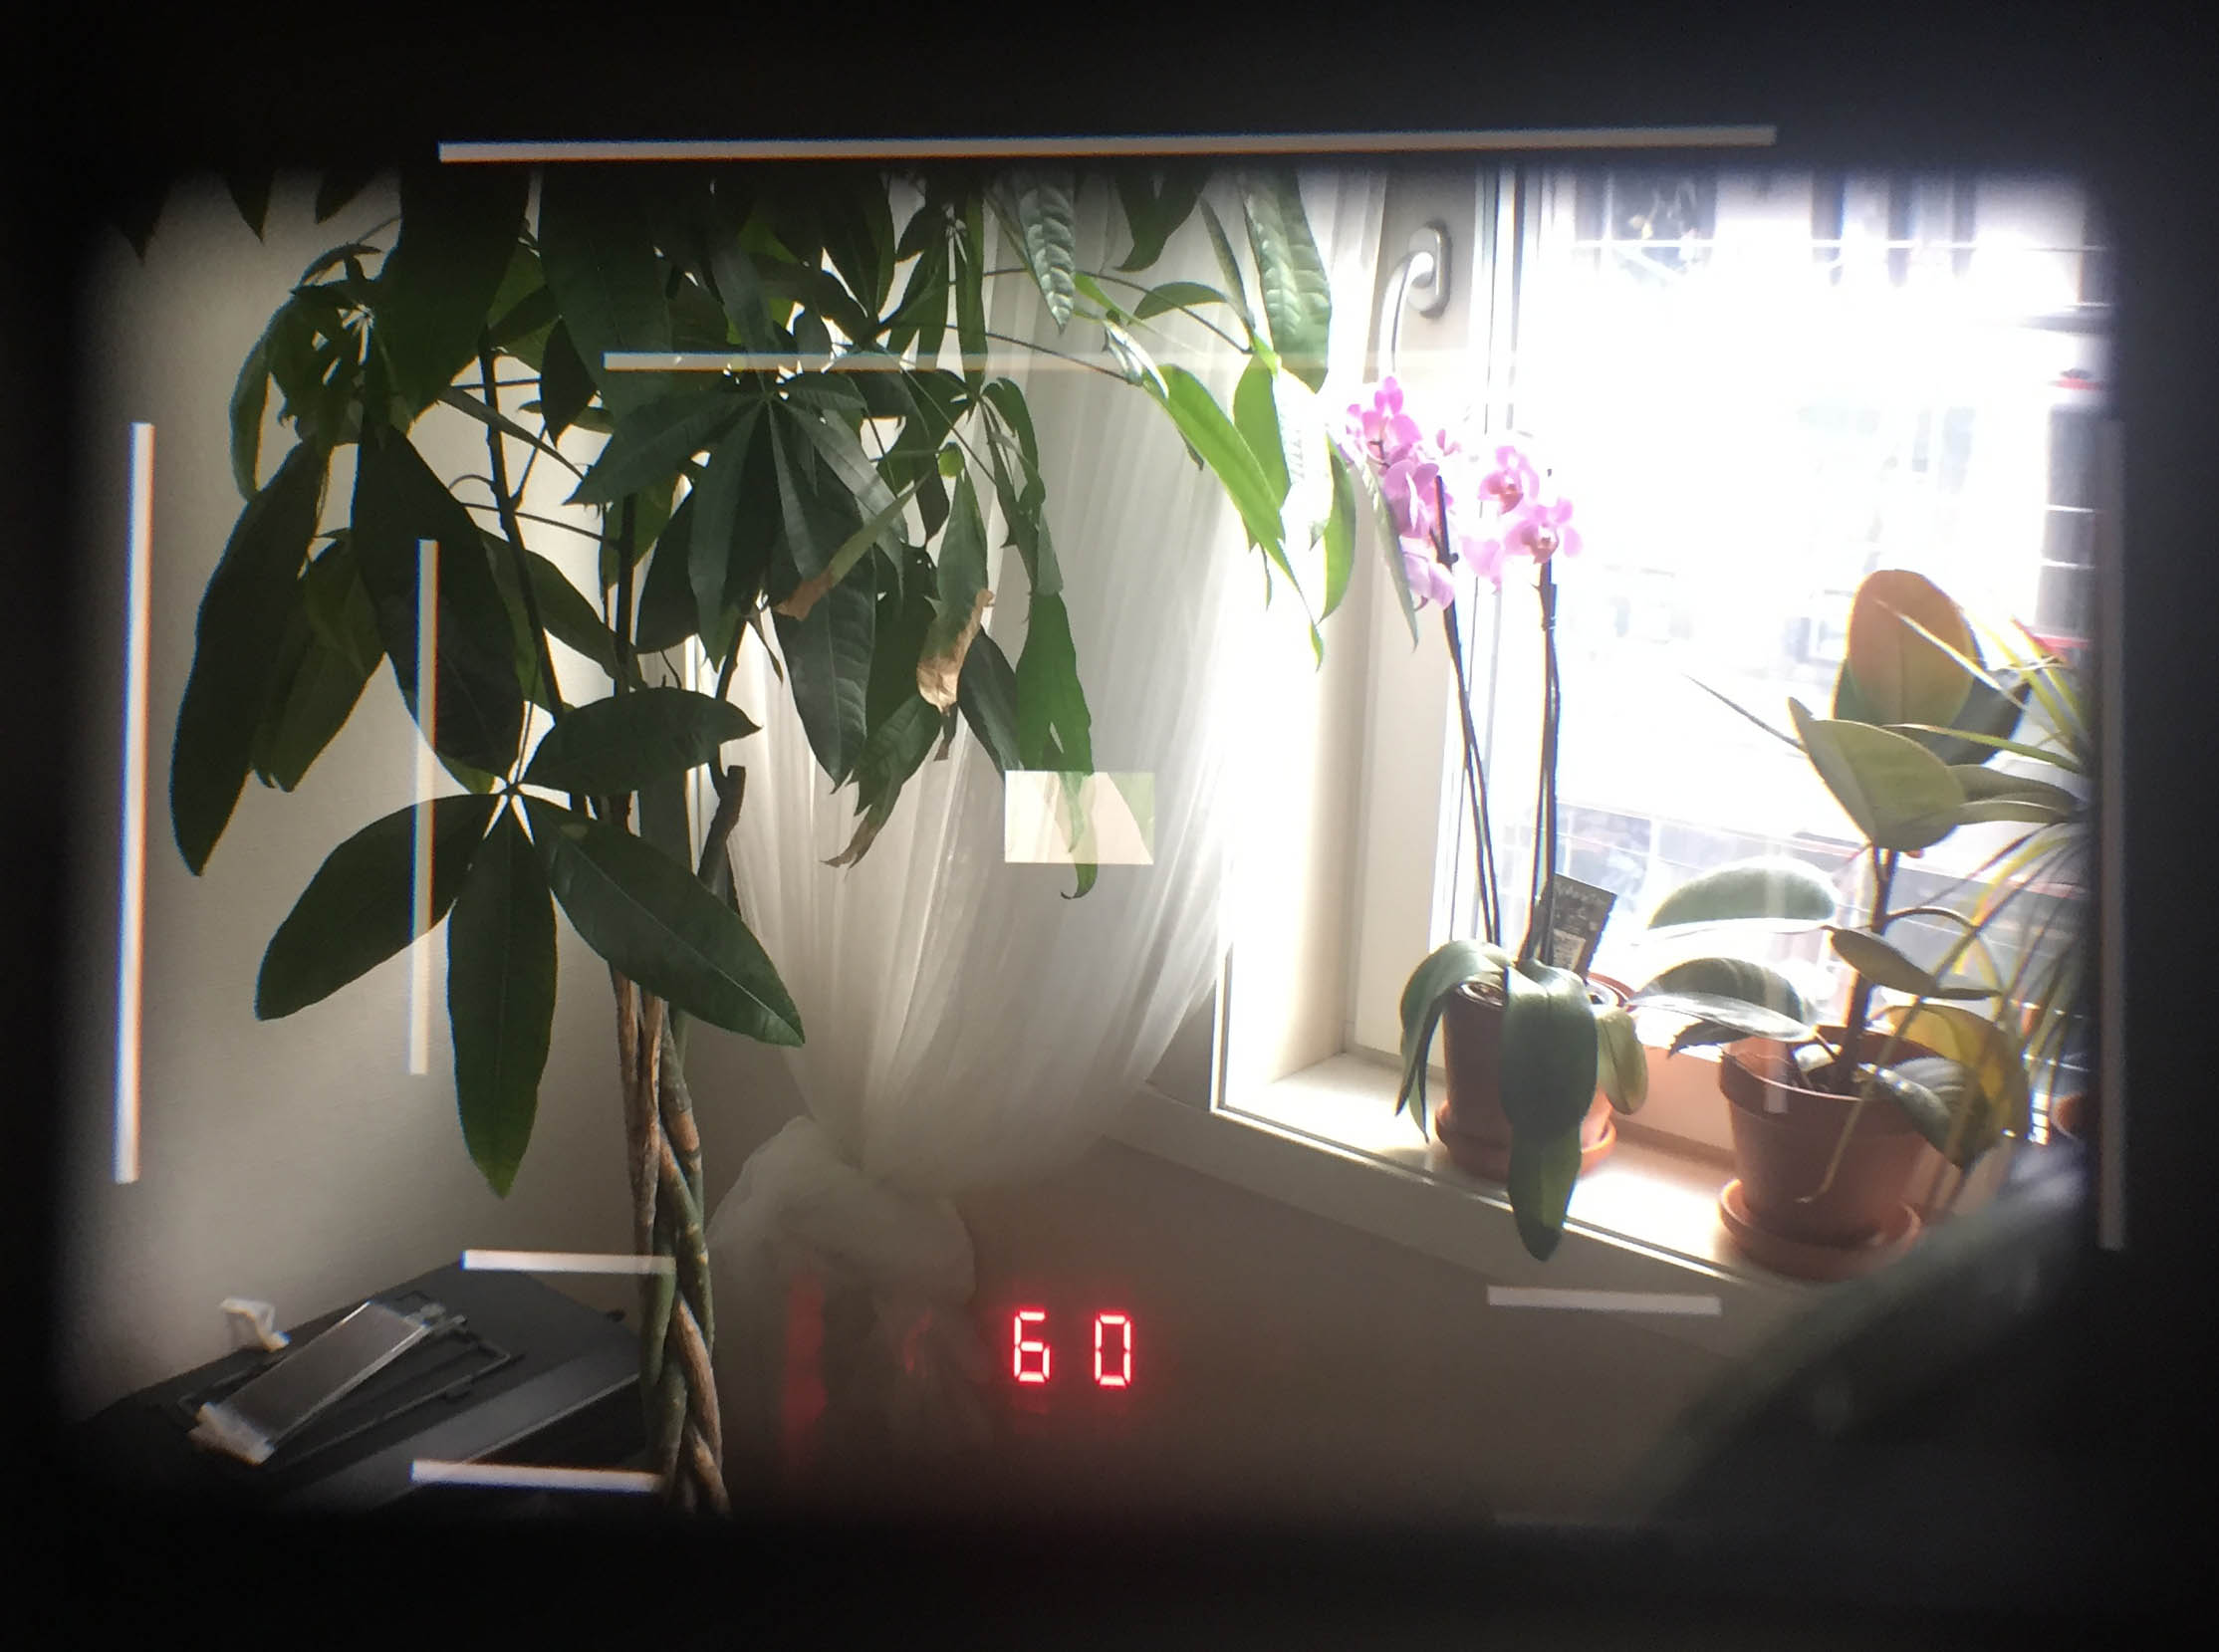 viewfinder-view